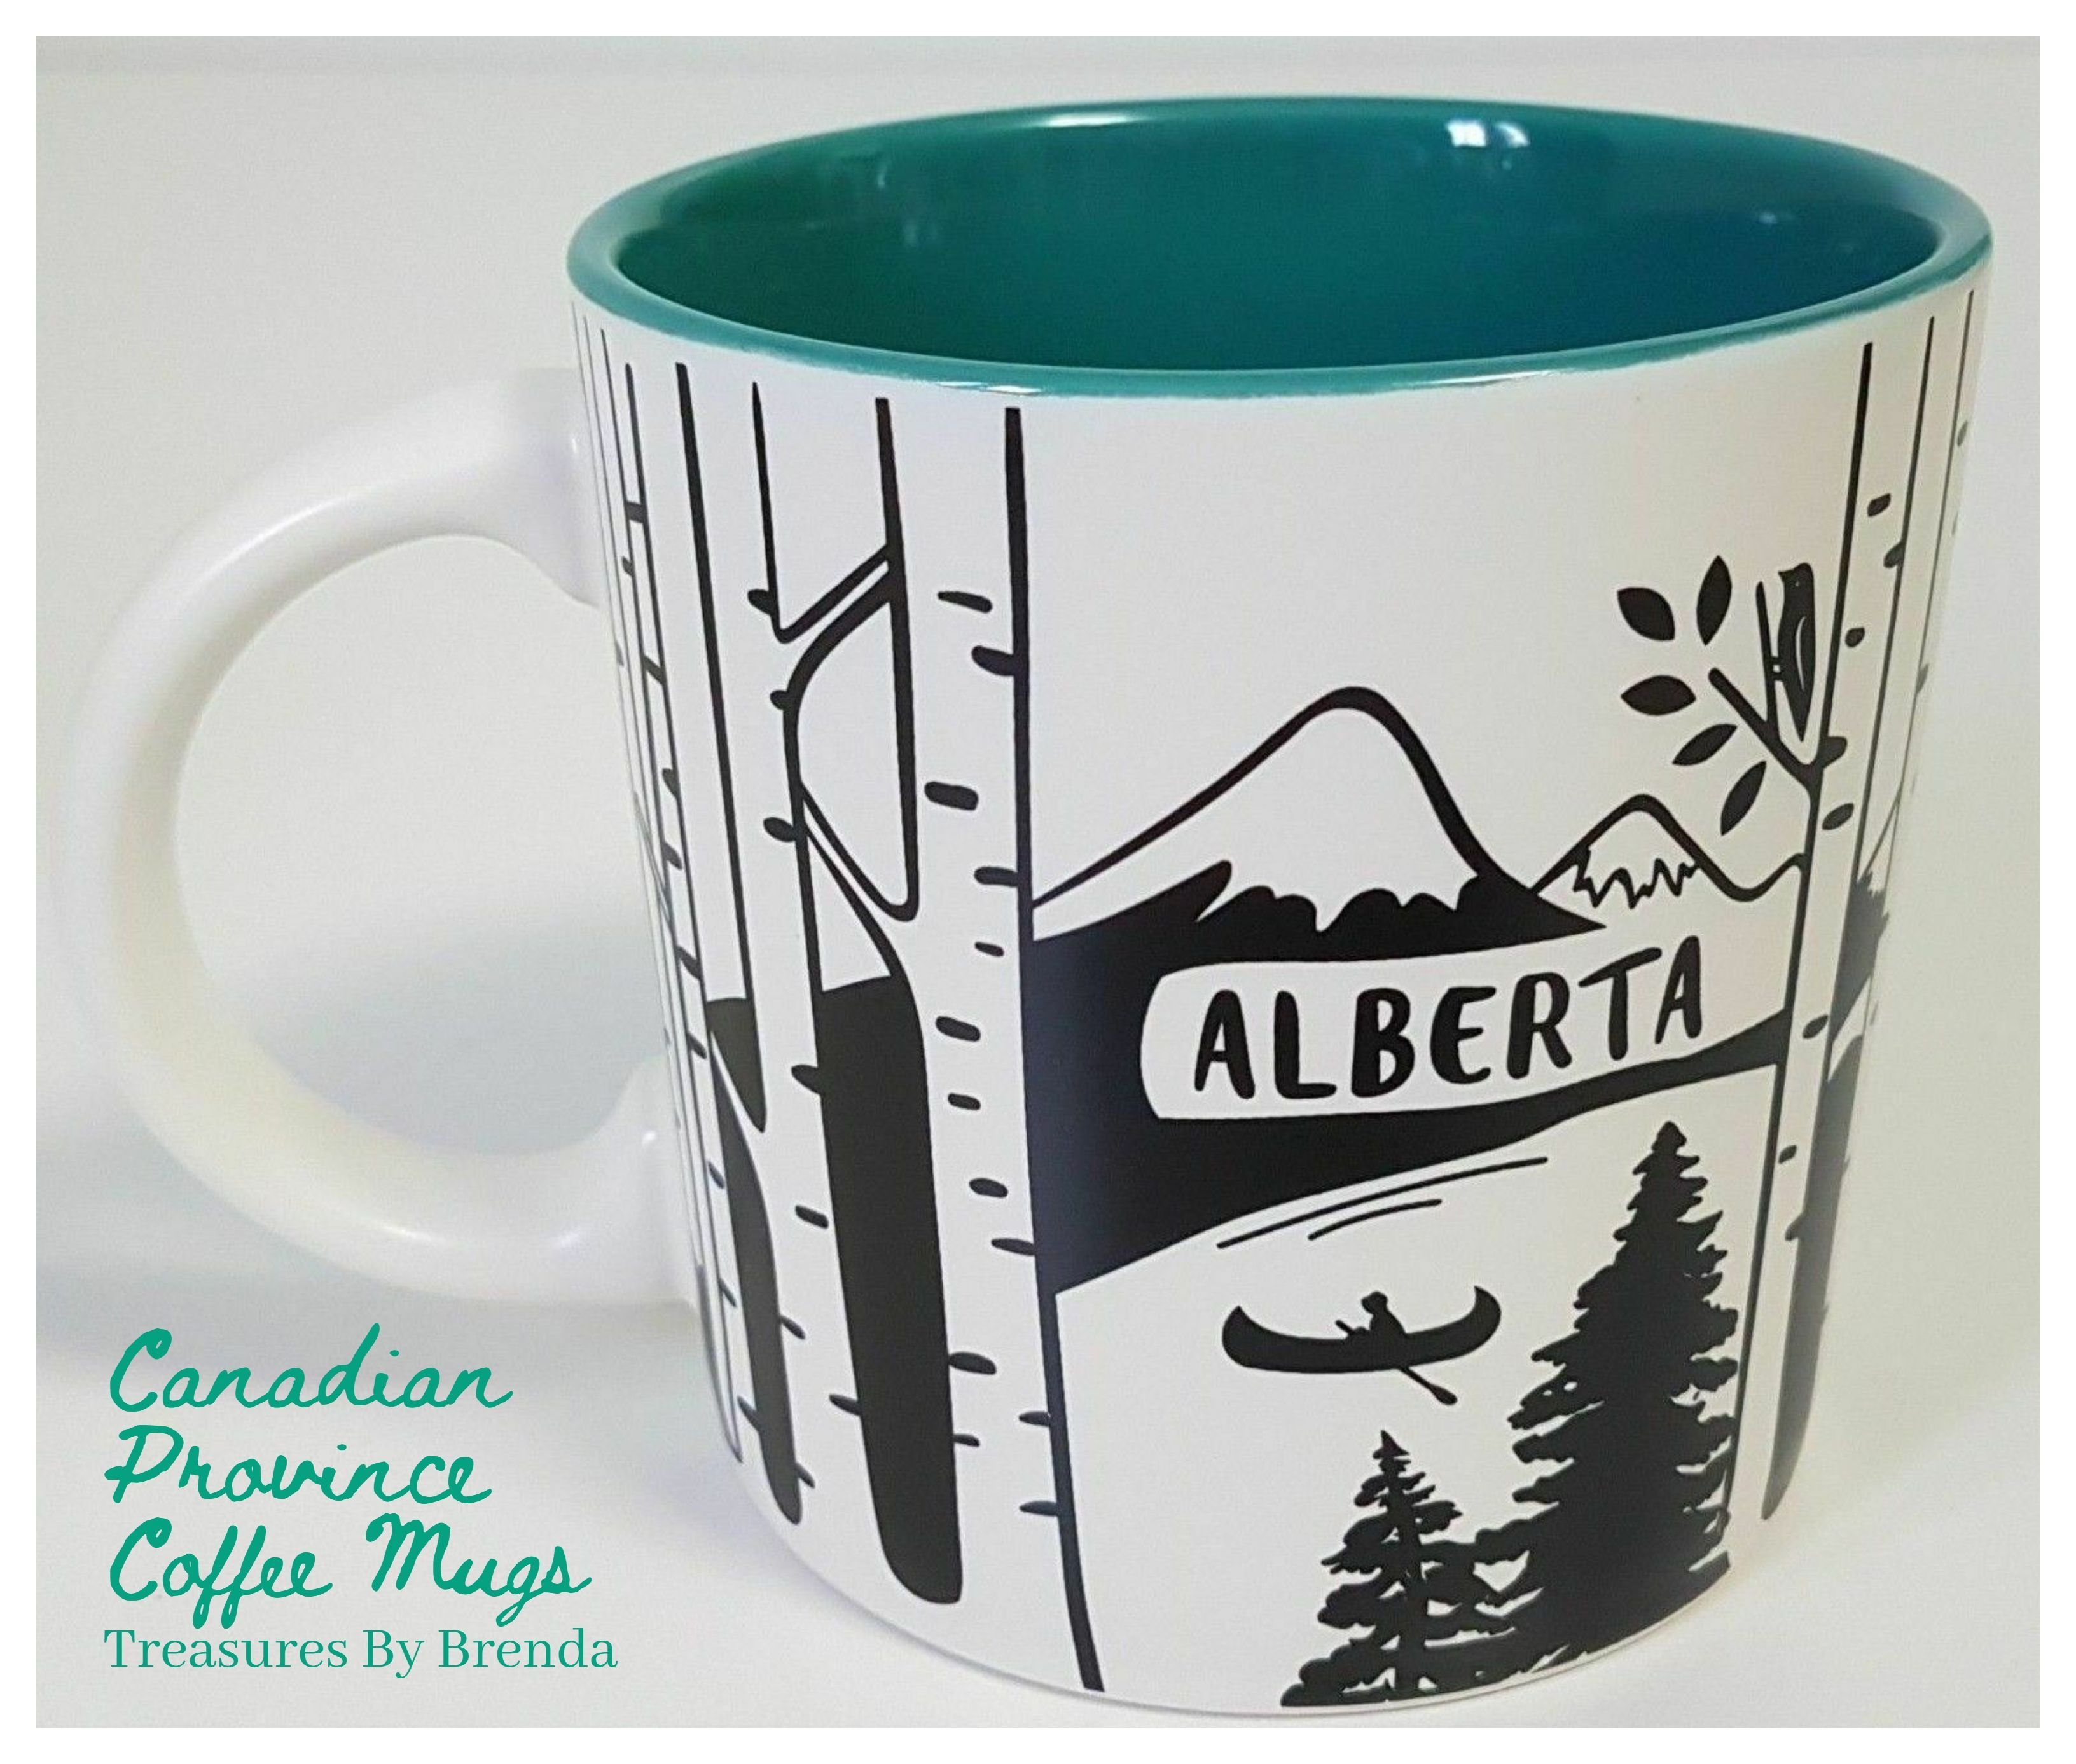 Canadian Province Coffee Cups Alberta in 2020 Tim